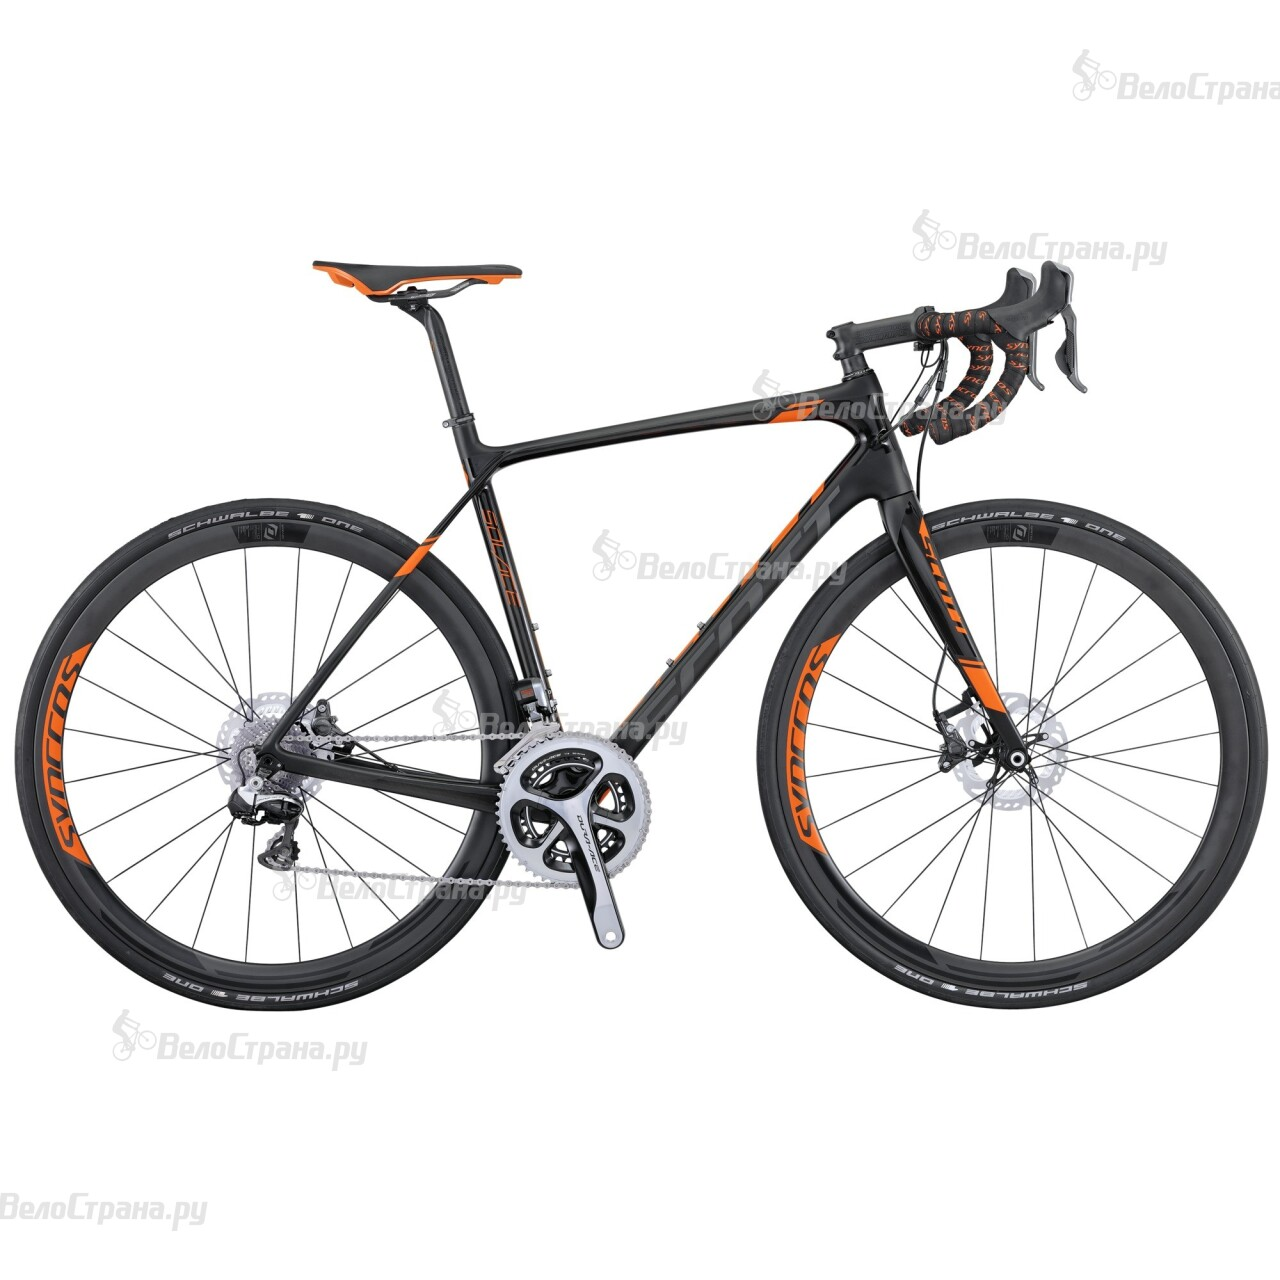 Велосипед Scott Solace Premium Disc (2016) велосипед scott solace 40 fb disc 2015